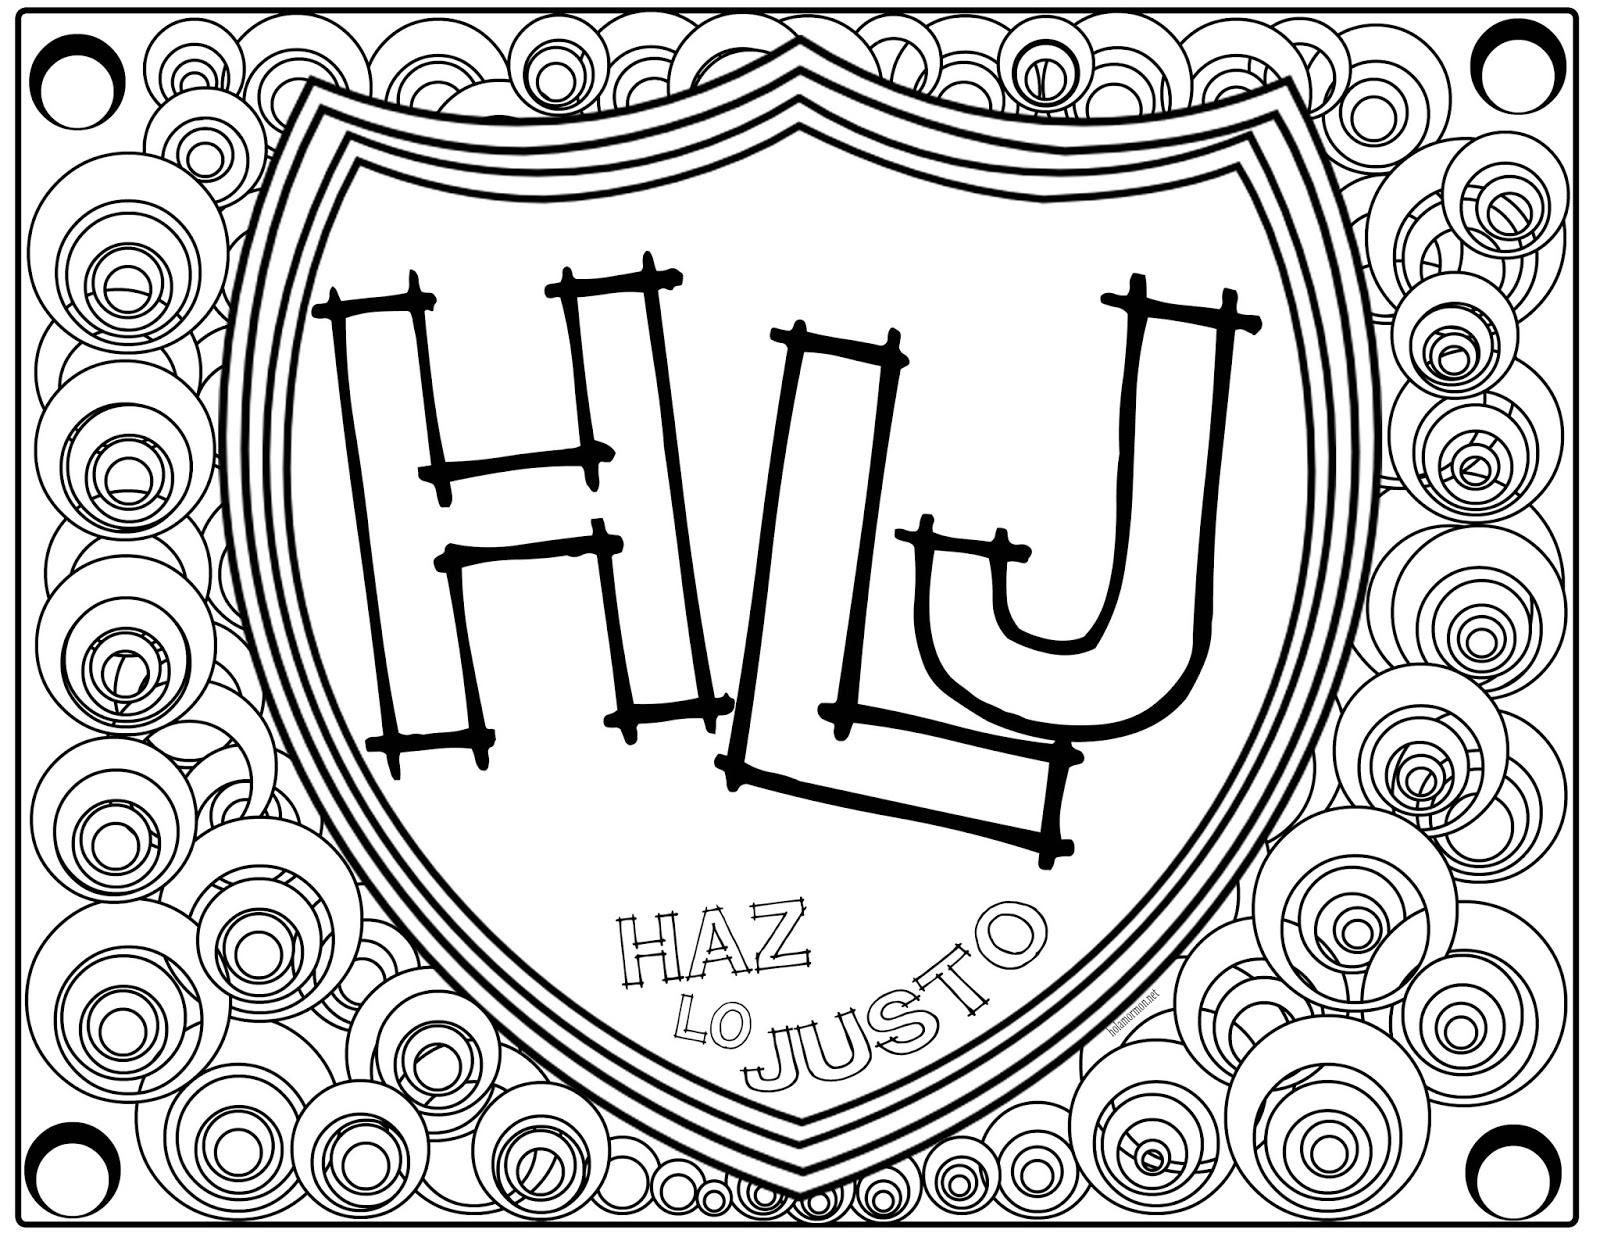 HOLAMORMON: PRIMARIA 2017 HAZ LO JUSTO